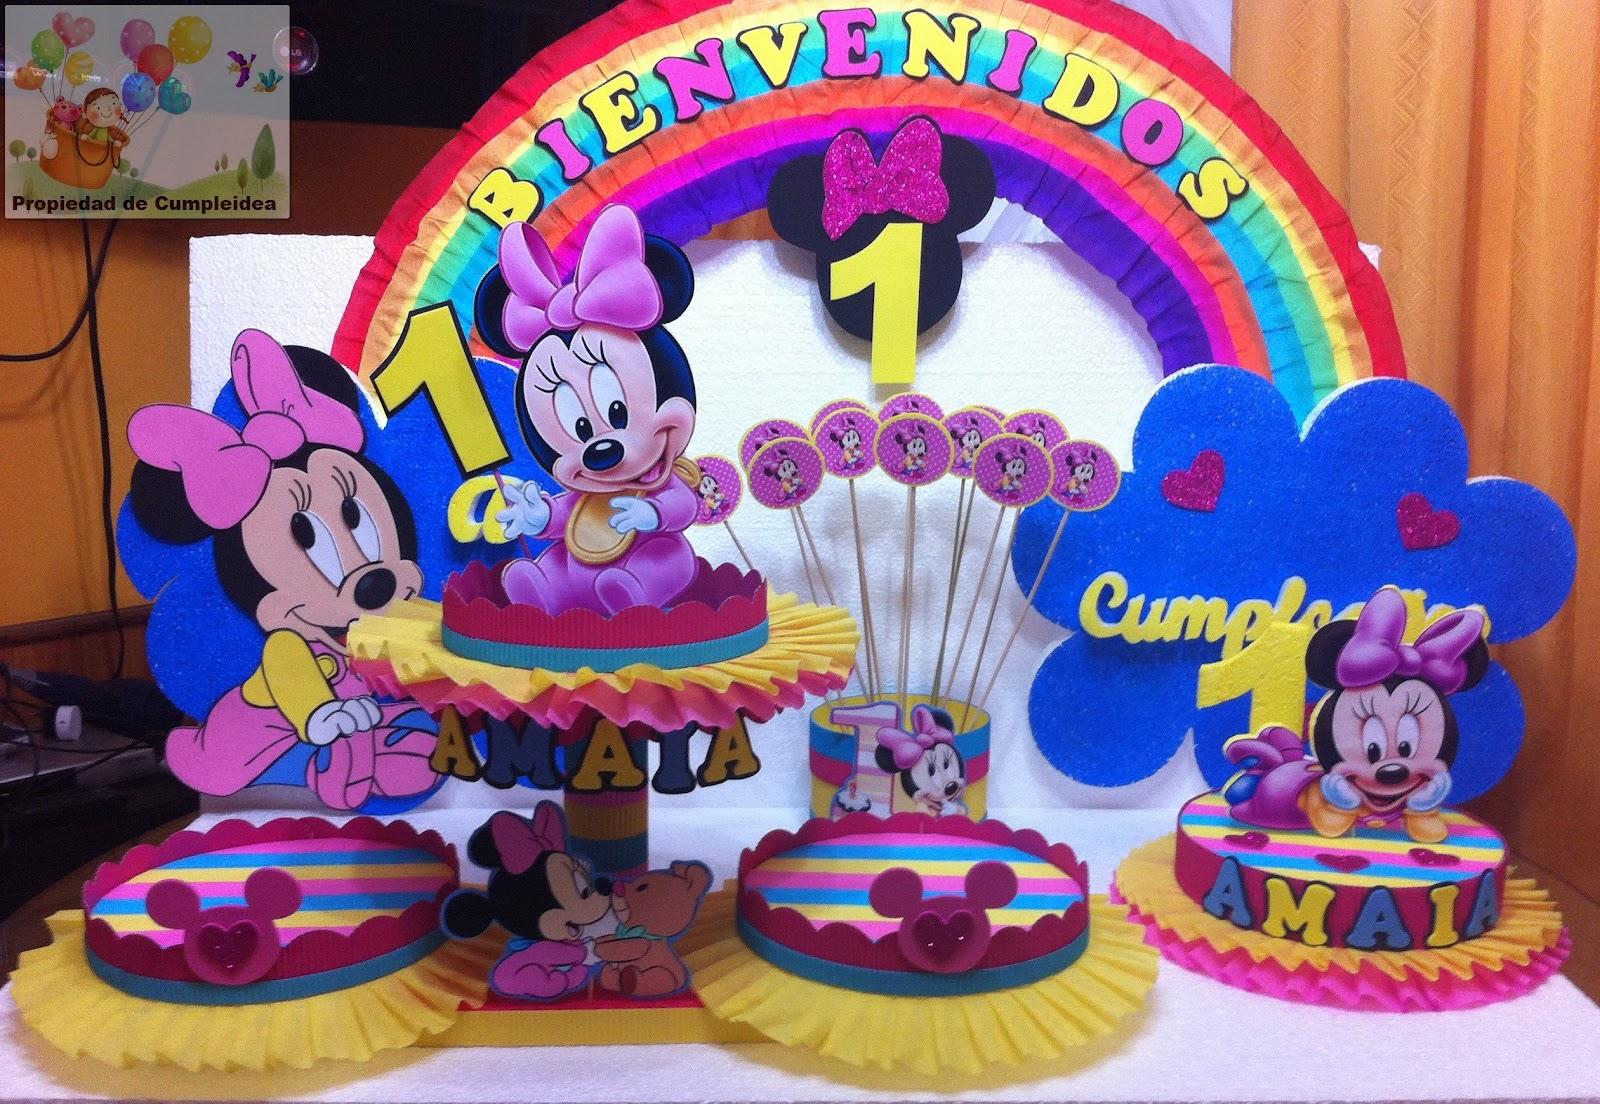 Decoraciones infantiles minnie mouse bebe for Decoracion cumpleanos bebe 1 ano